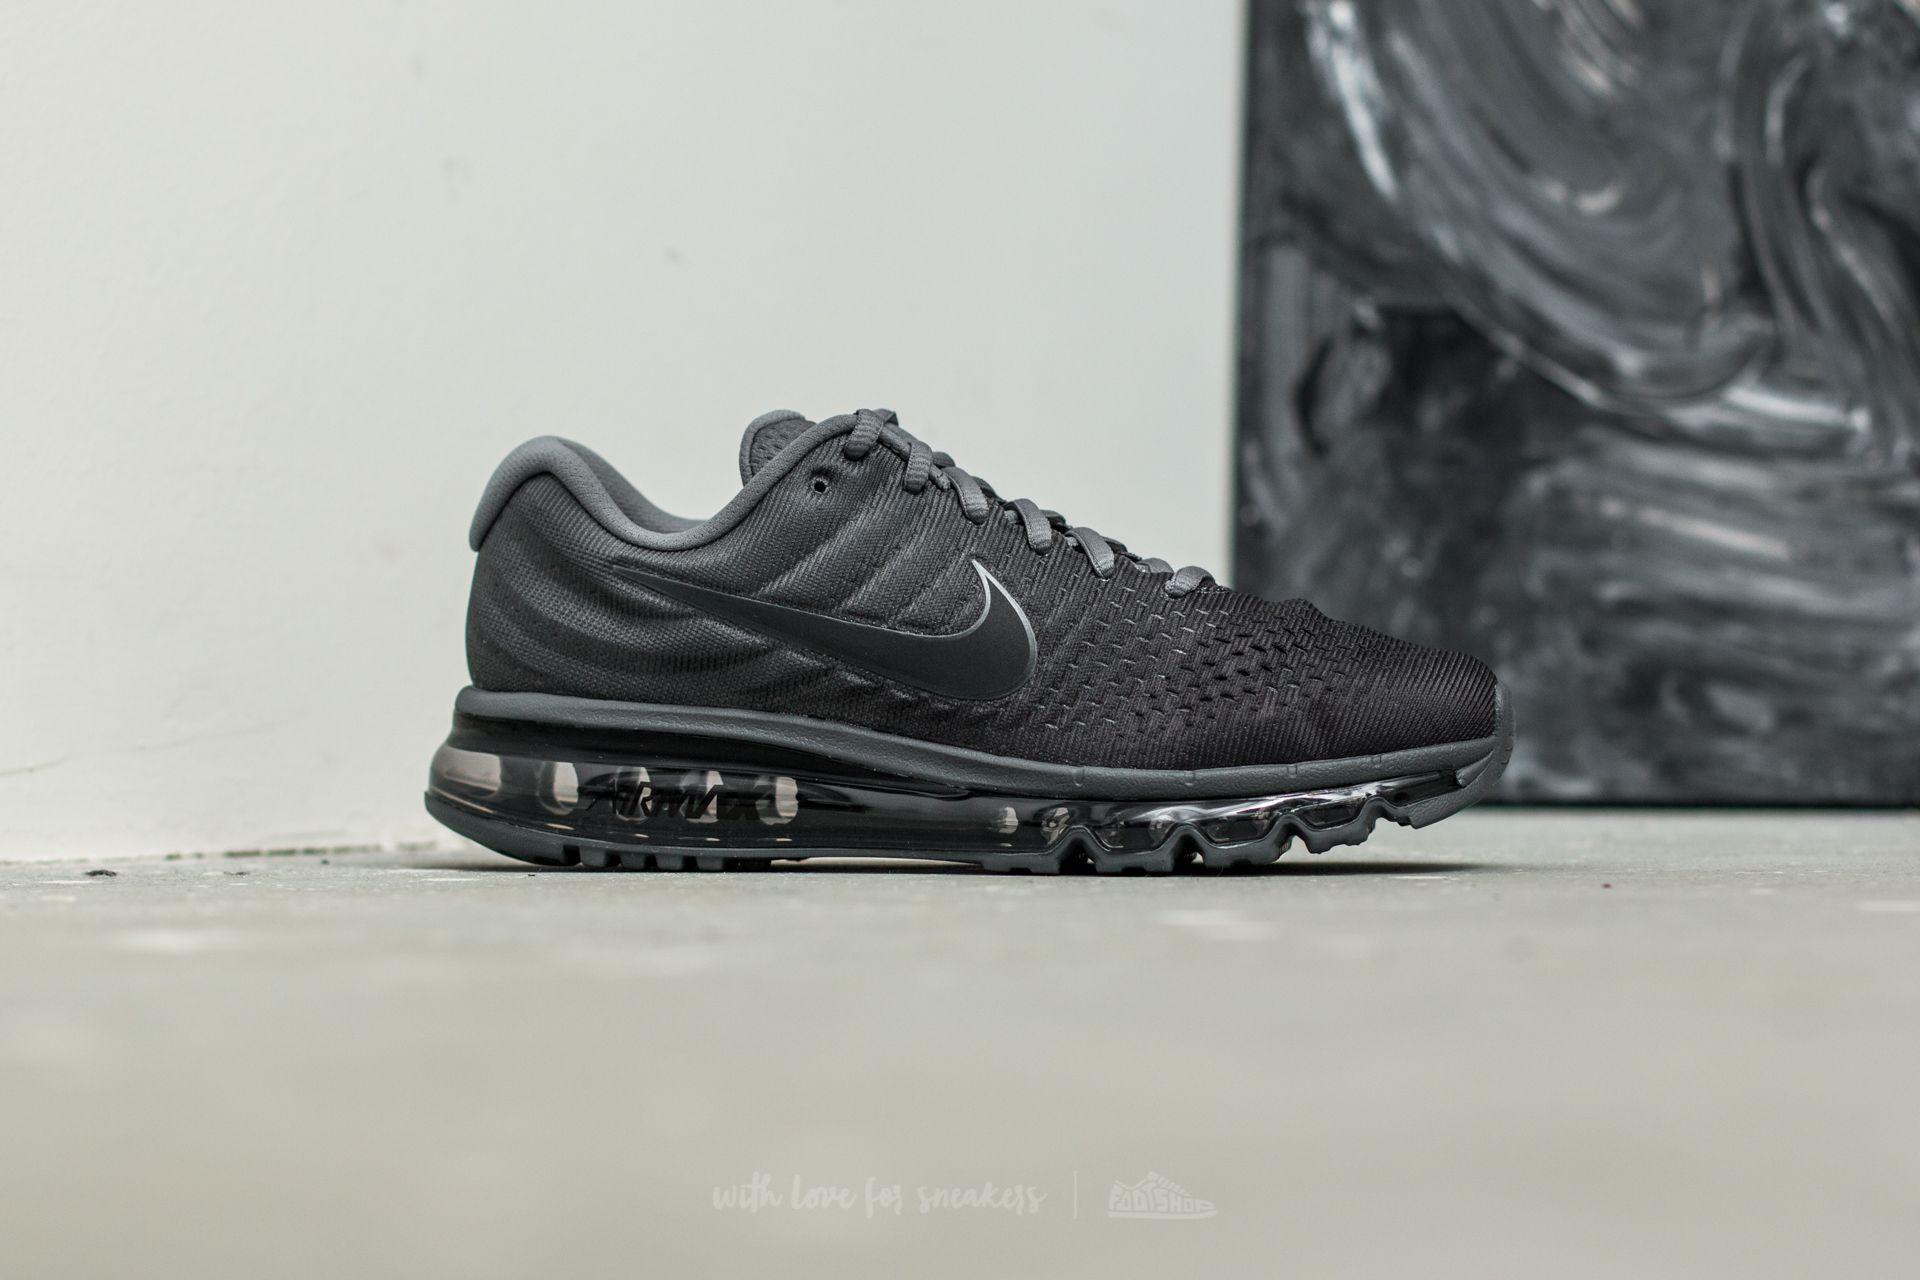 Nike Air Max 2017 Cool Grey/ Anthracite-Dark Grey | Footshop